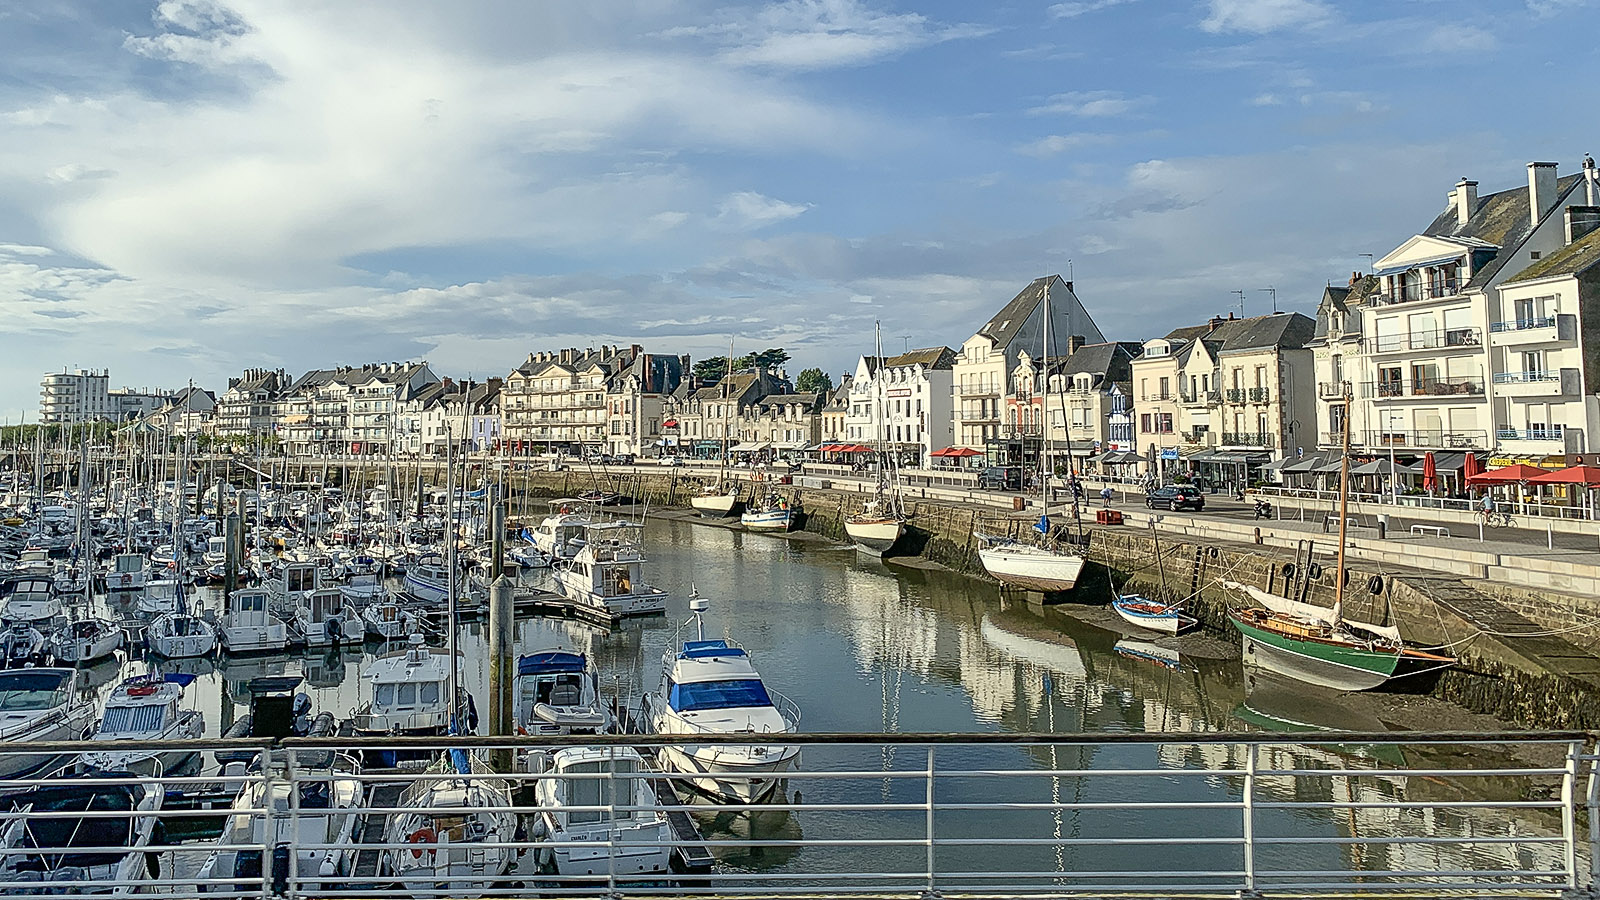 Der Hafen von La Baule-Le Pouliguen. Foto: Hilke Maunder